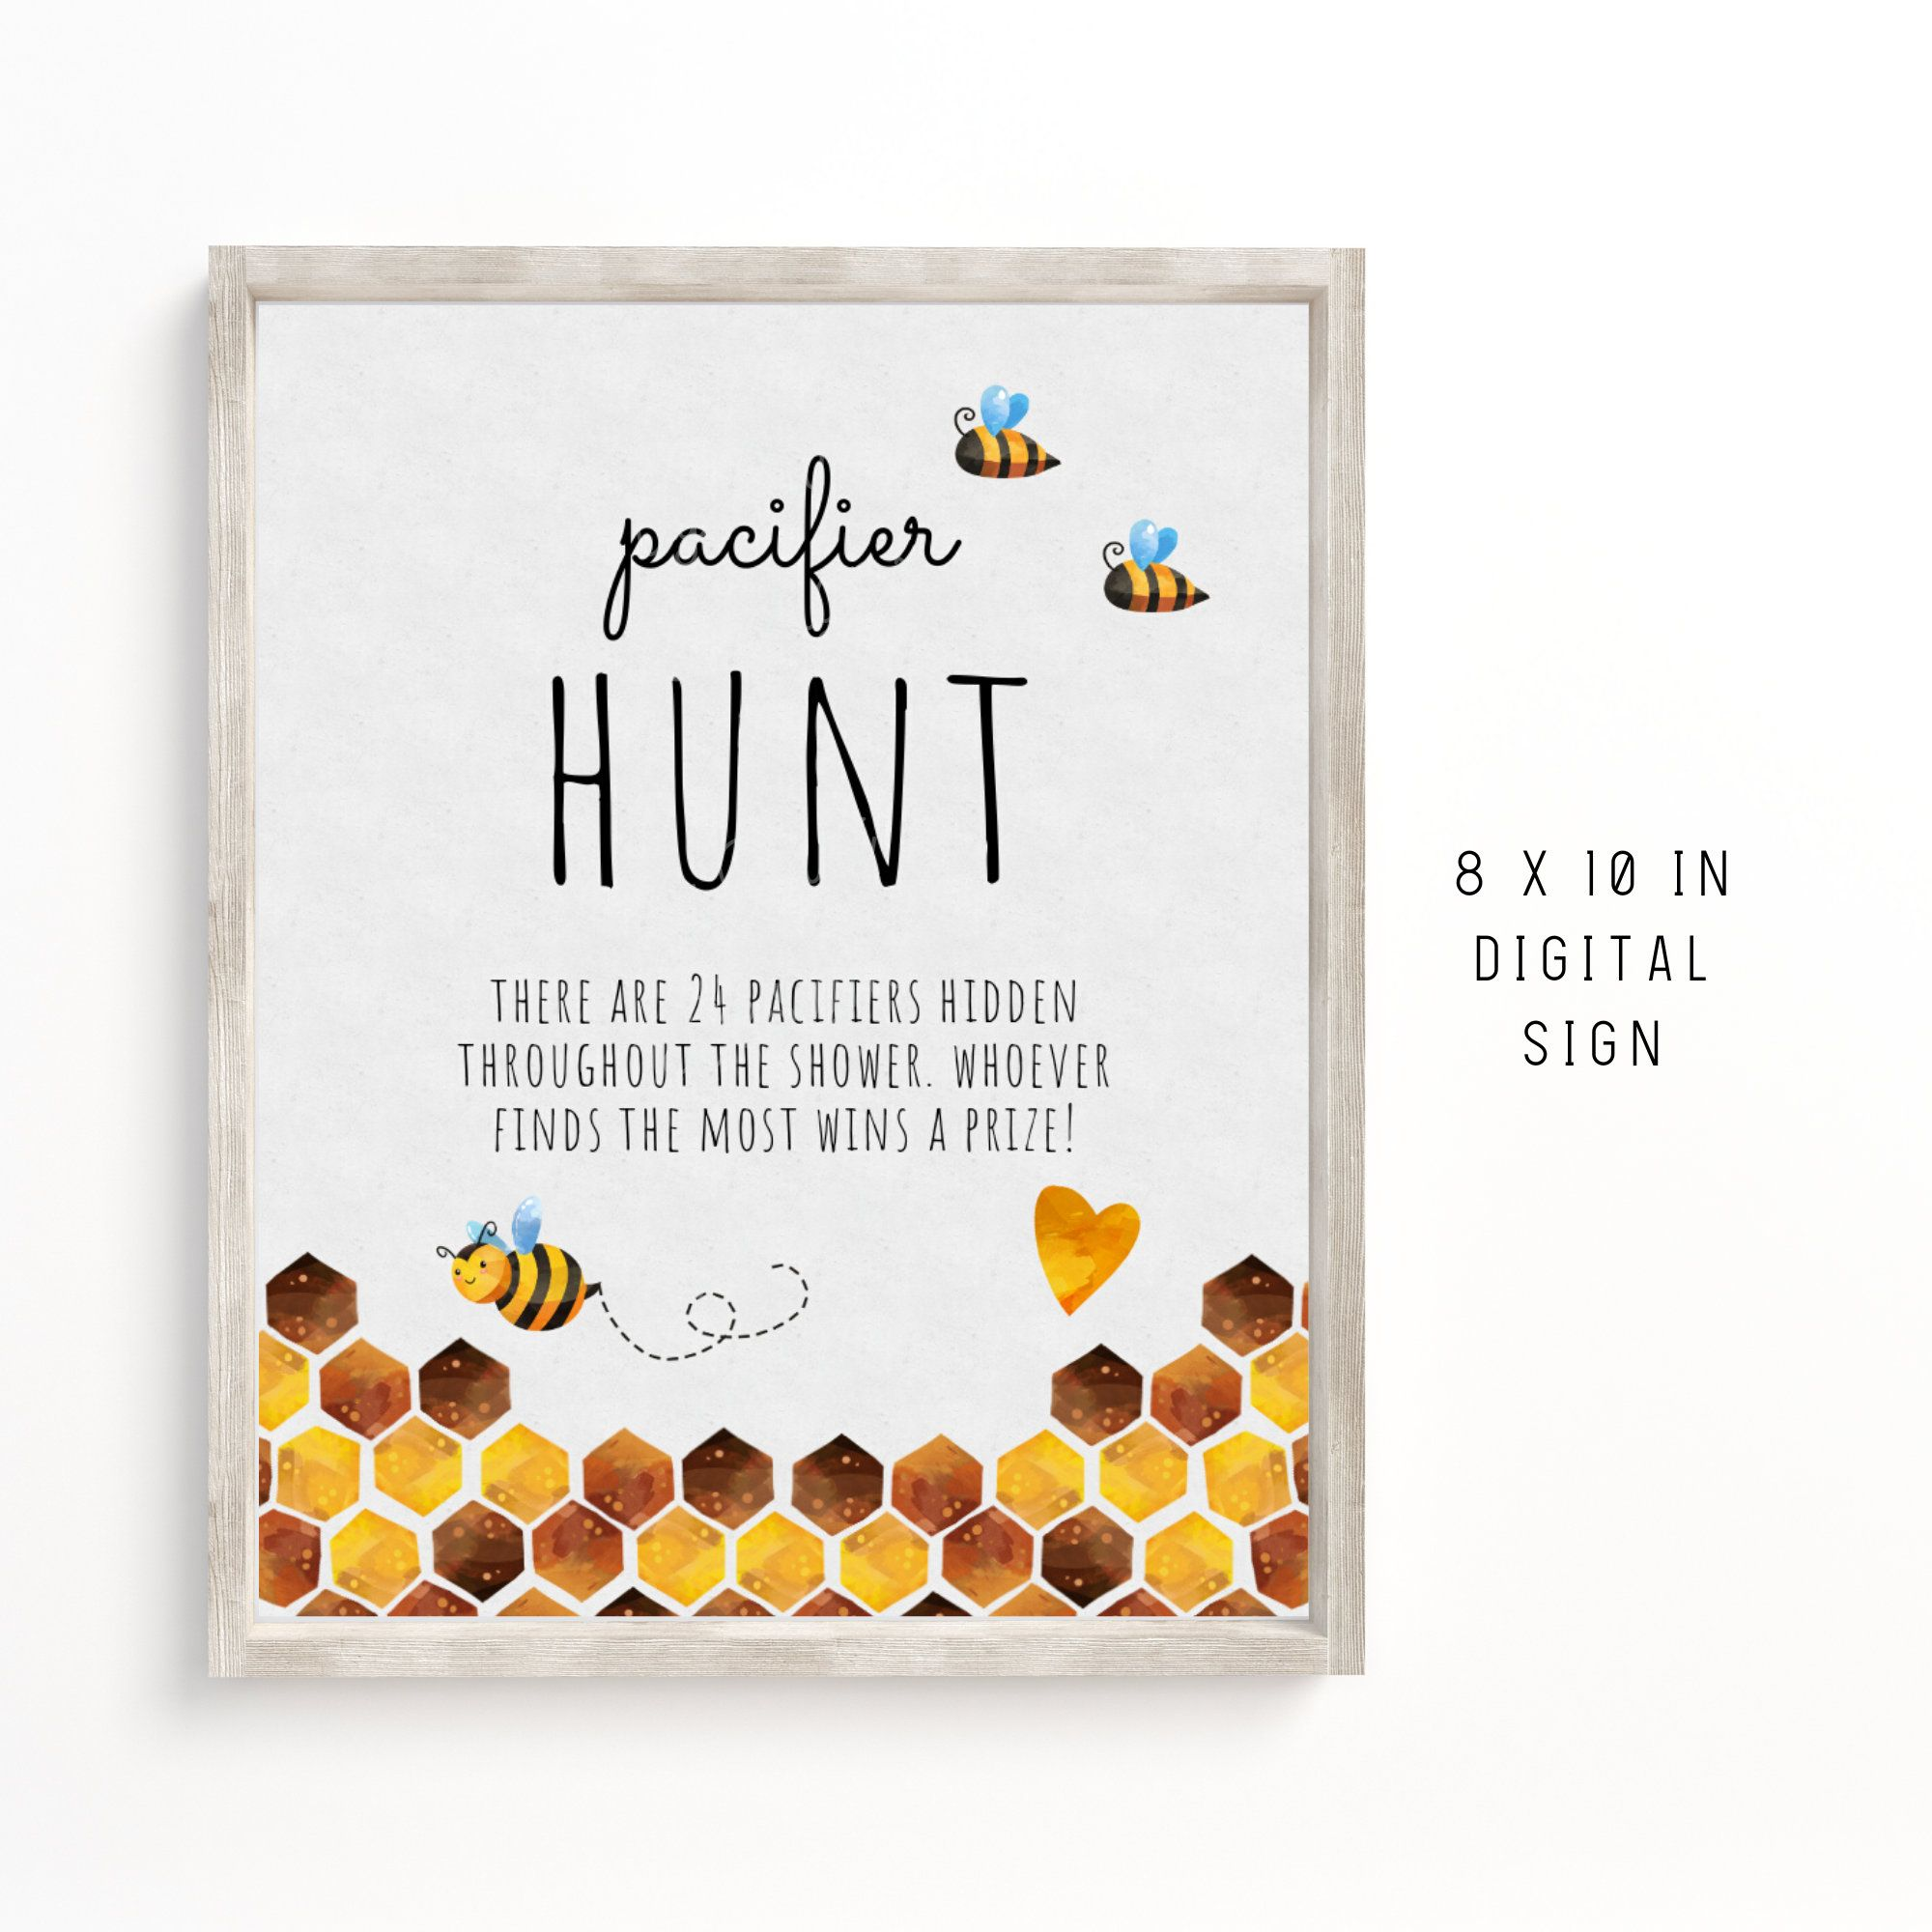 Instant Download Bumble Bee Baby Shower Pacifier Hunt Sign, 8x 10 Honey Bee Pacifier Hunt Sign, Printable Bee Baby Shower Sign, BEBS01